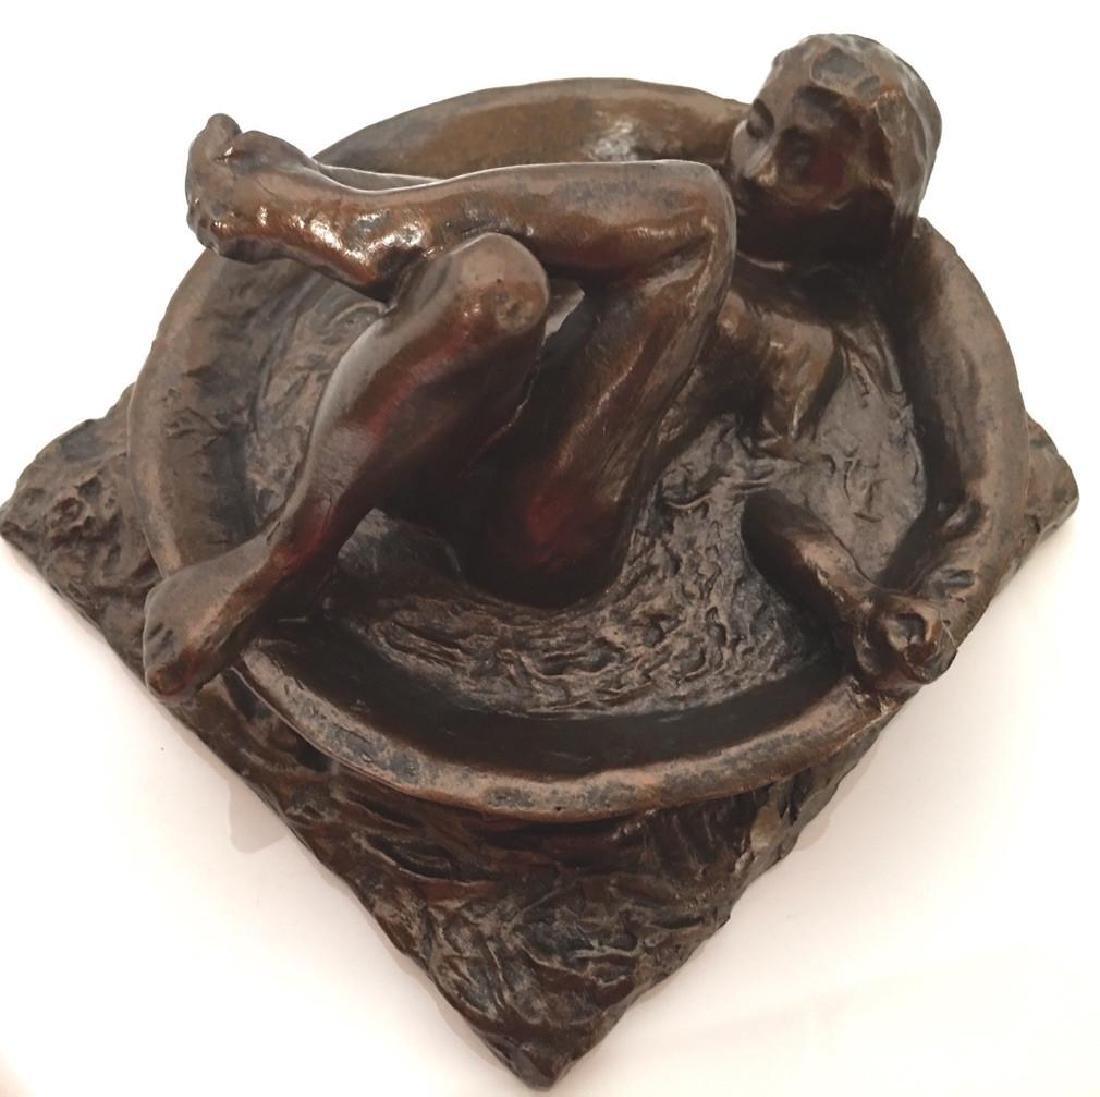 After Edgar Degas: Woman Bathing Statue